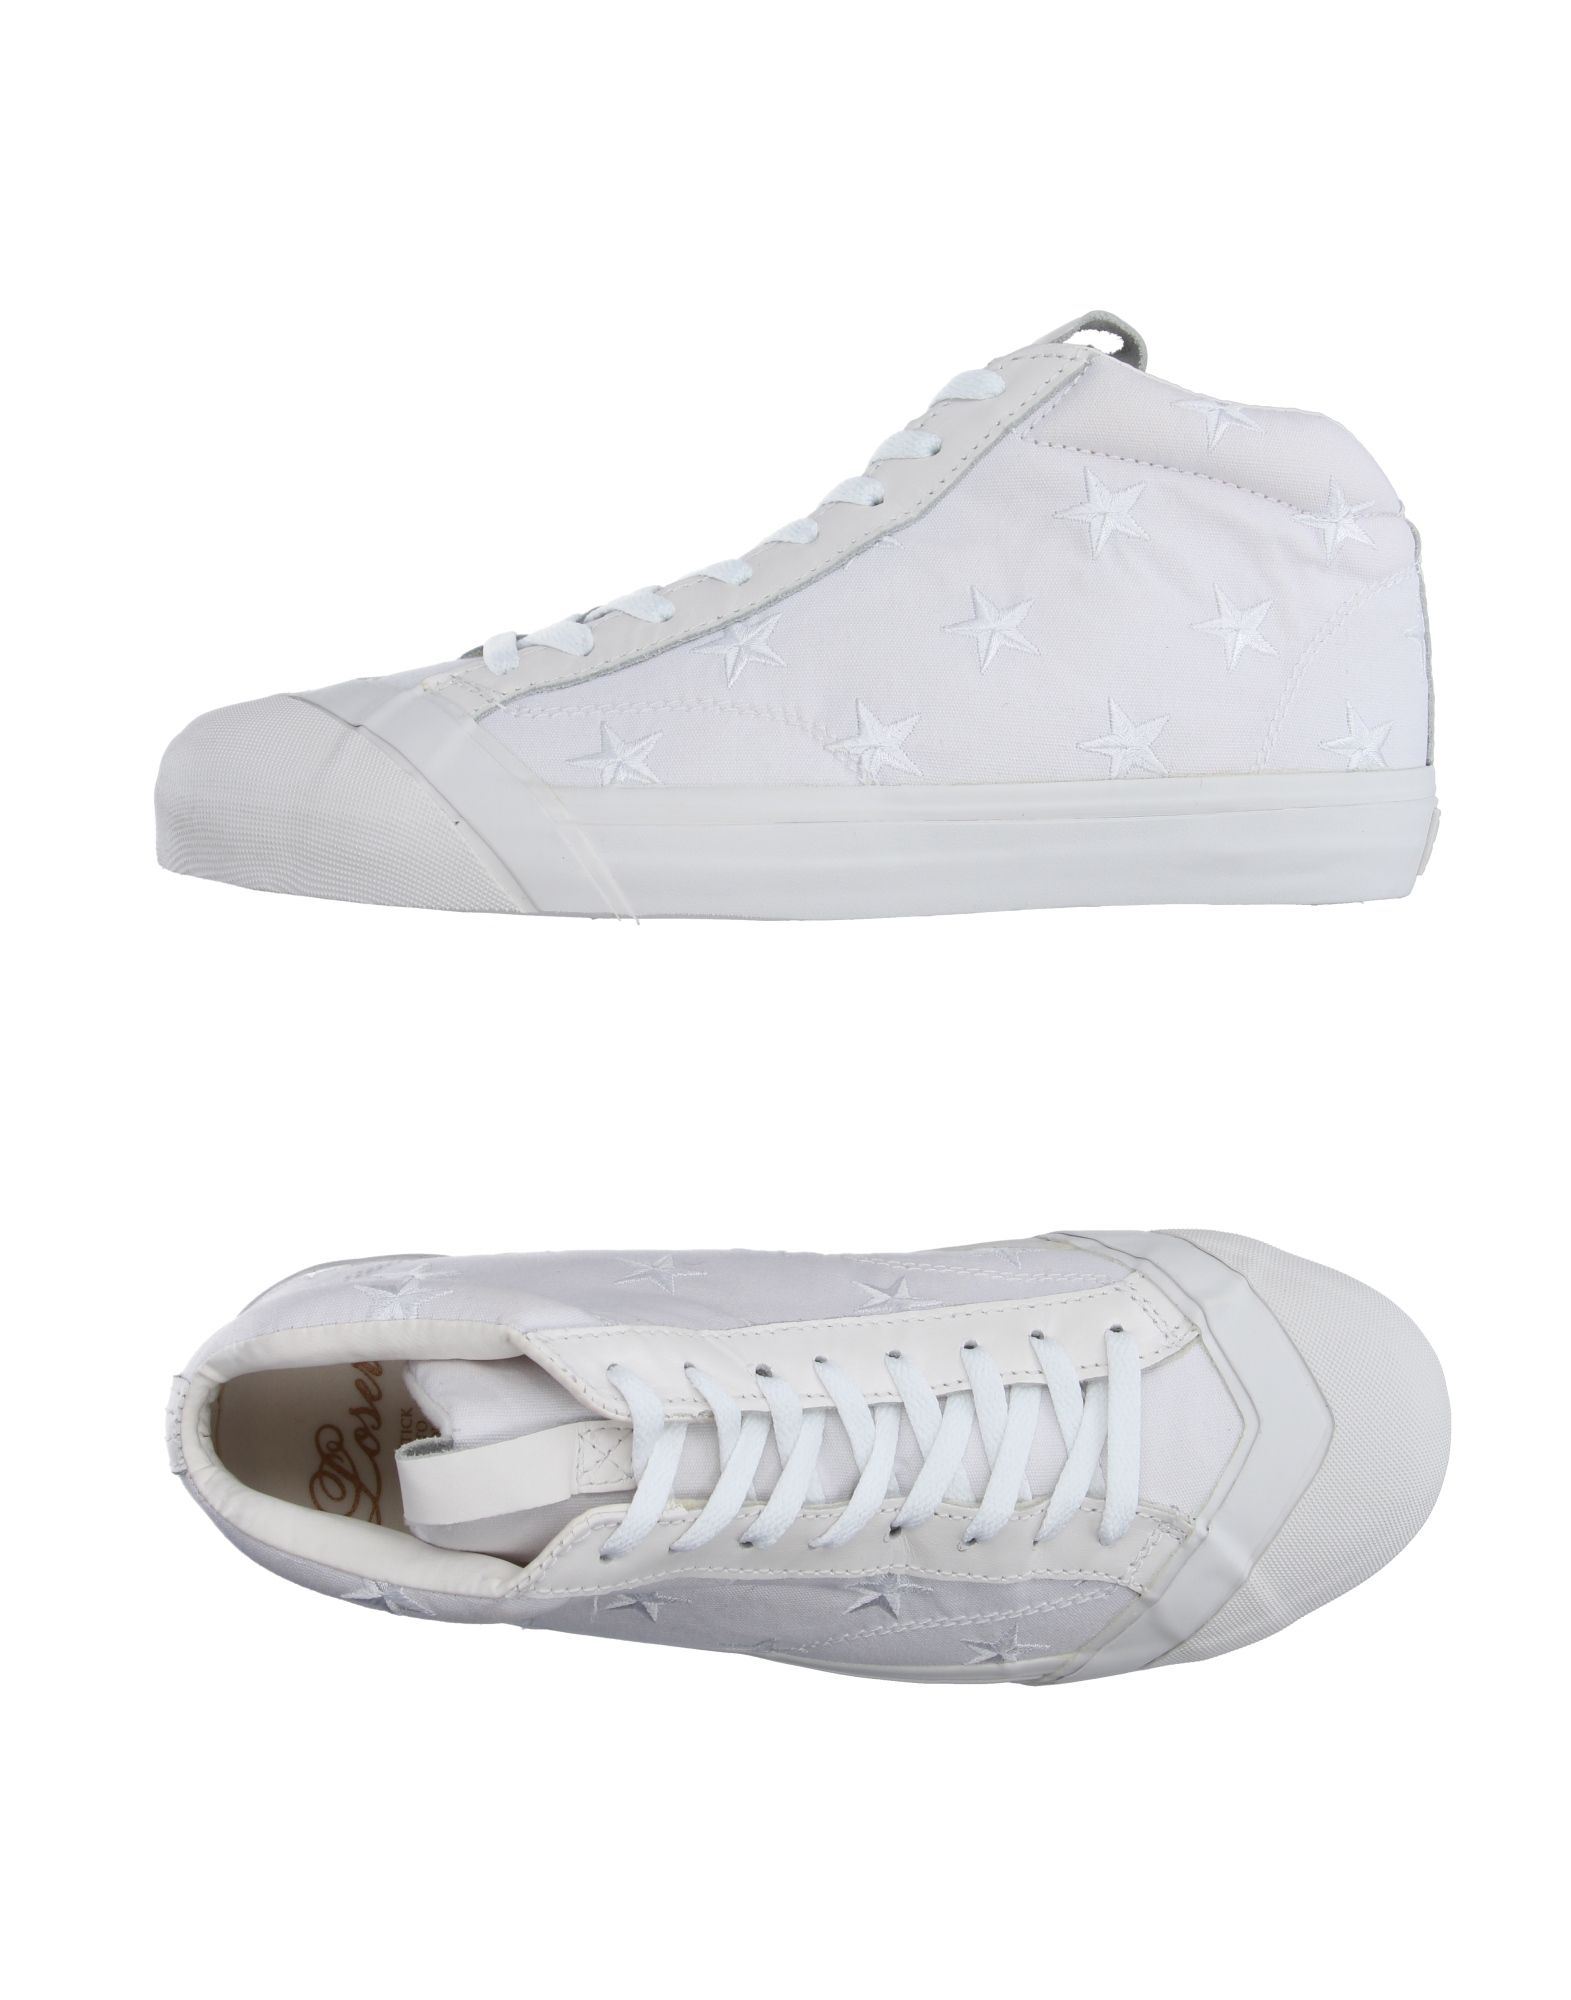 LOSERS Высокие кеды и кроссовки кеды кроссовки высокие dc council mid tx stone camo